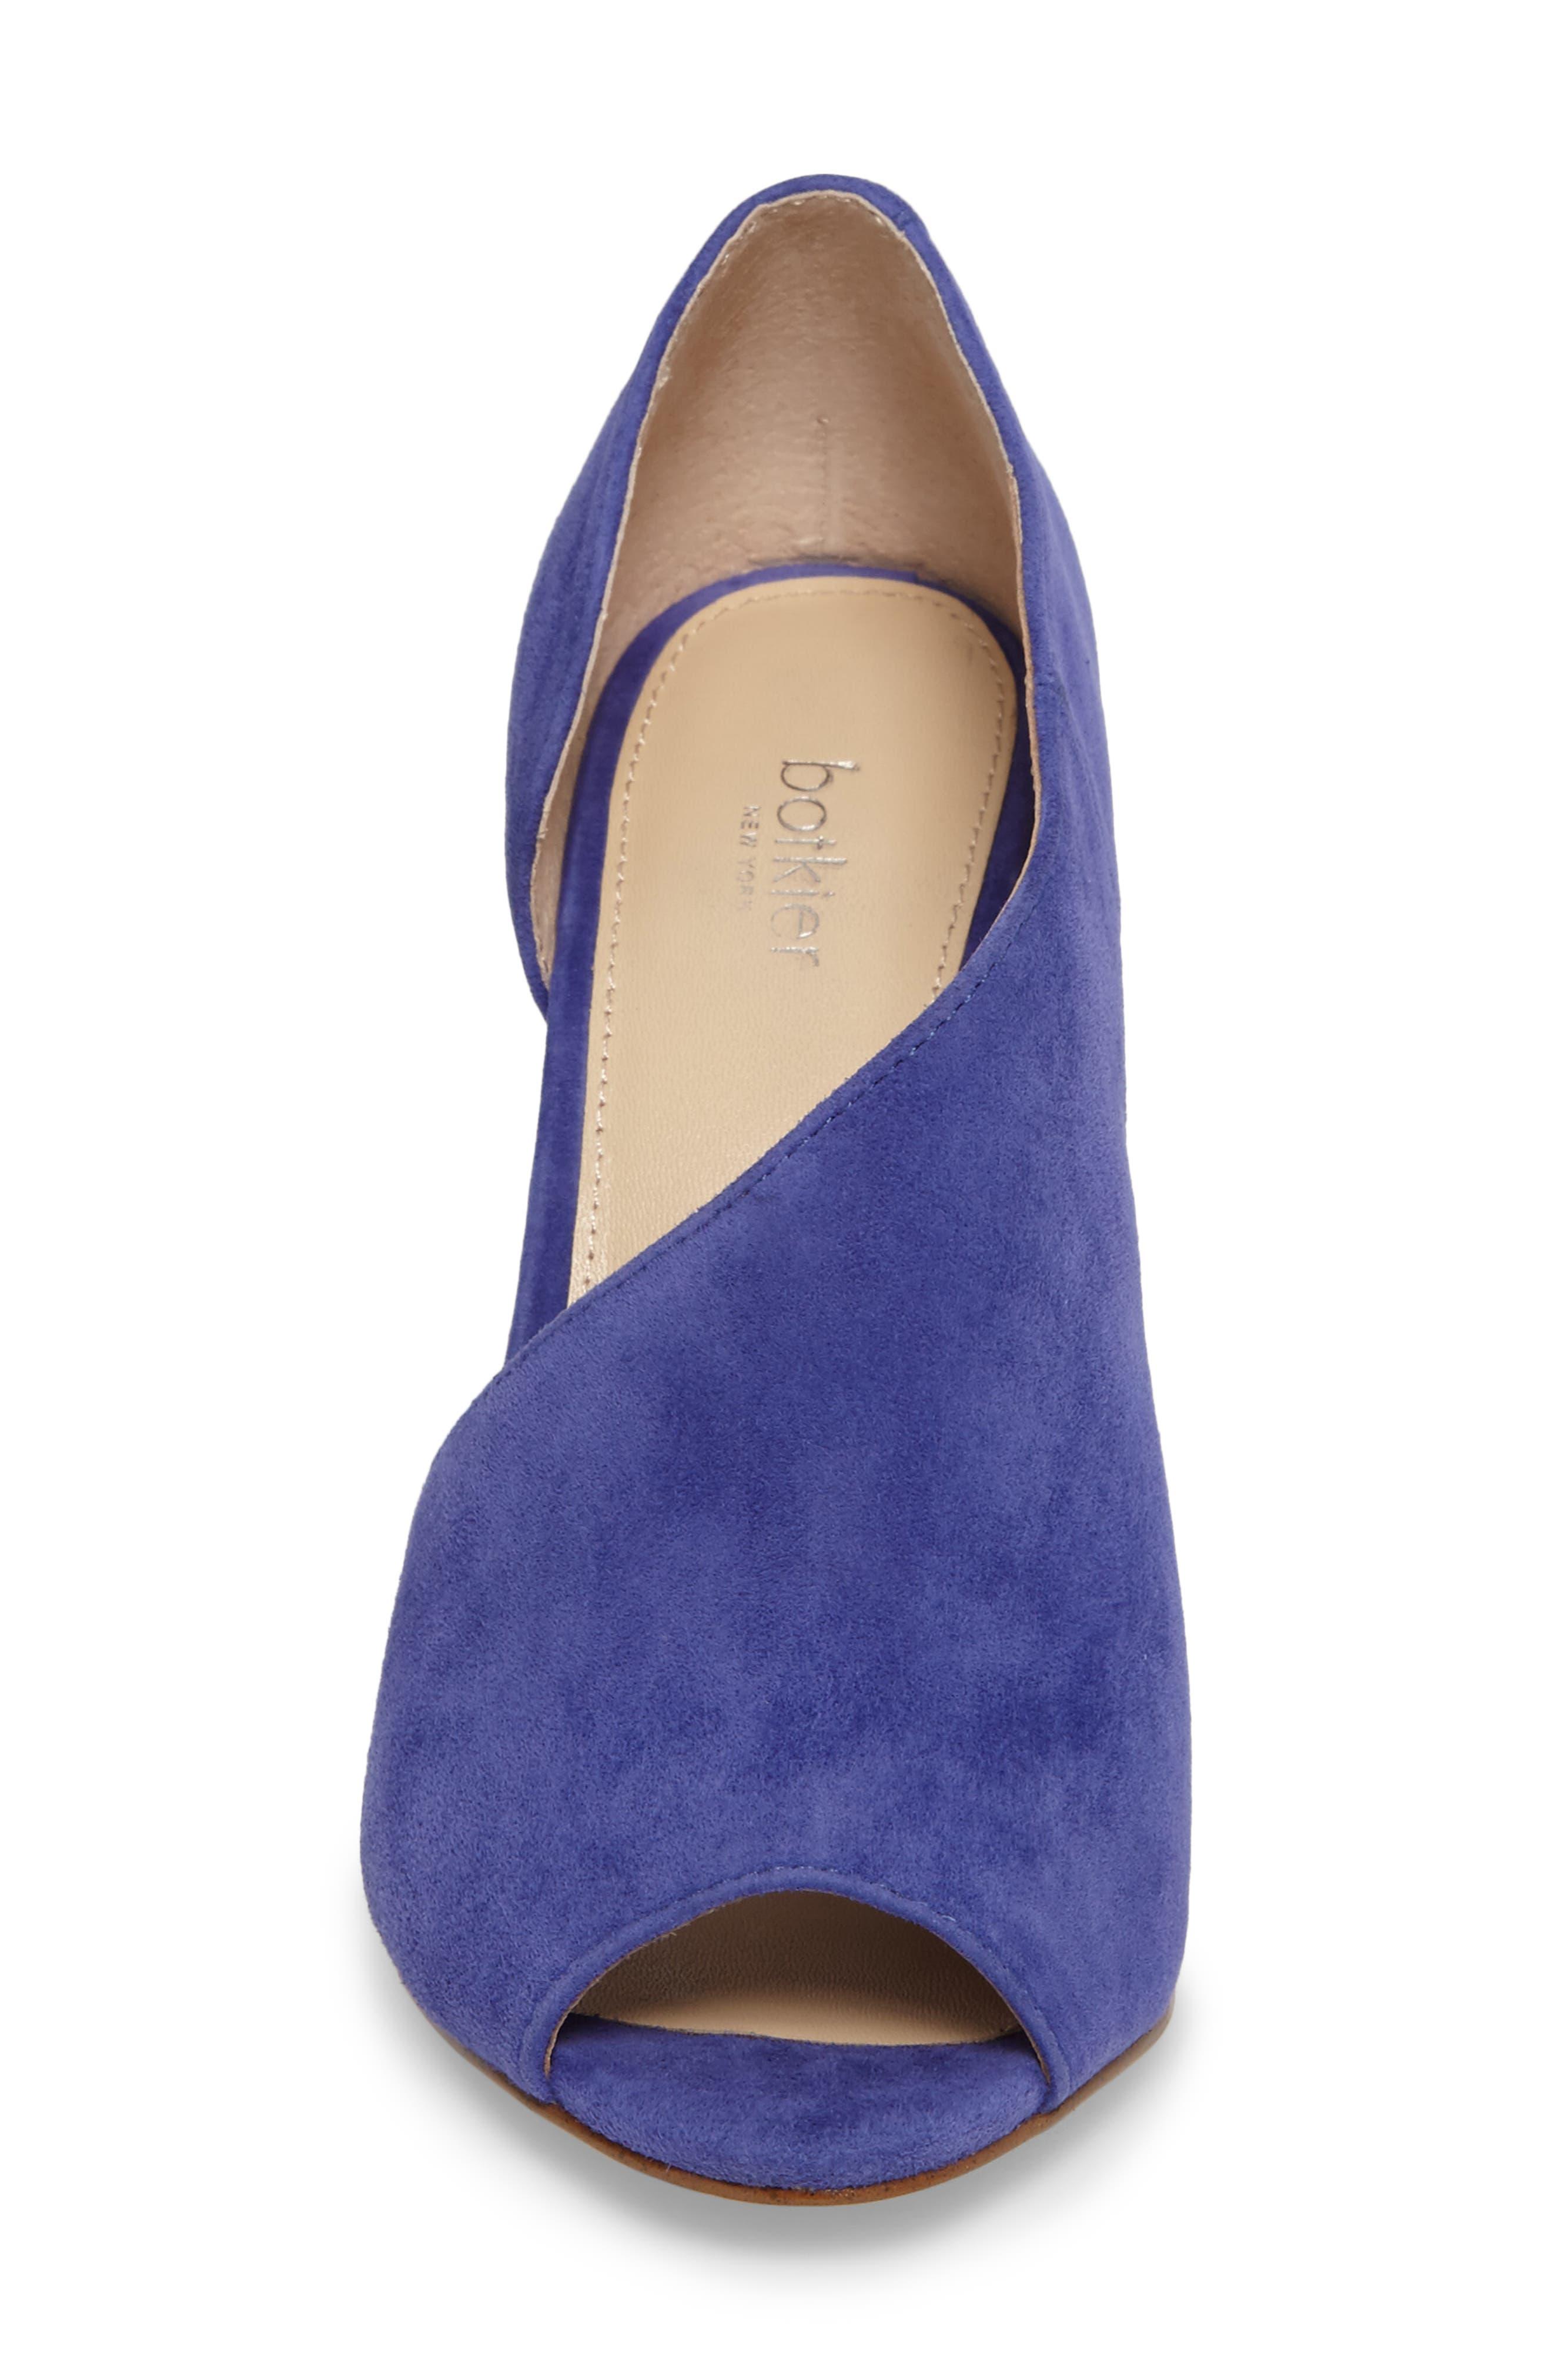 Adelia Asymmetrical Sandal,                             Alternate thumbnail 4, color,                             Blue